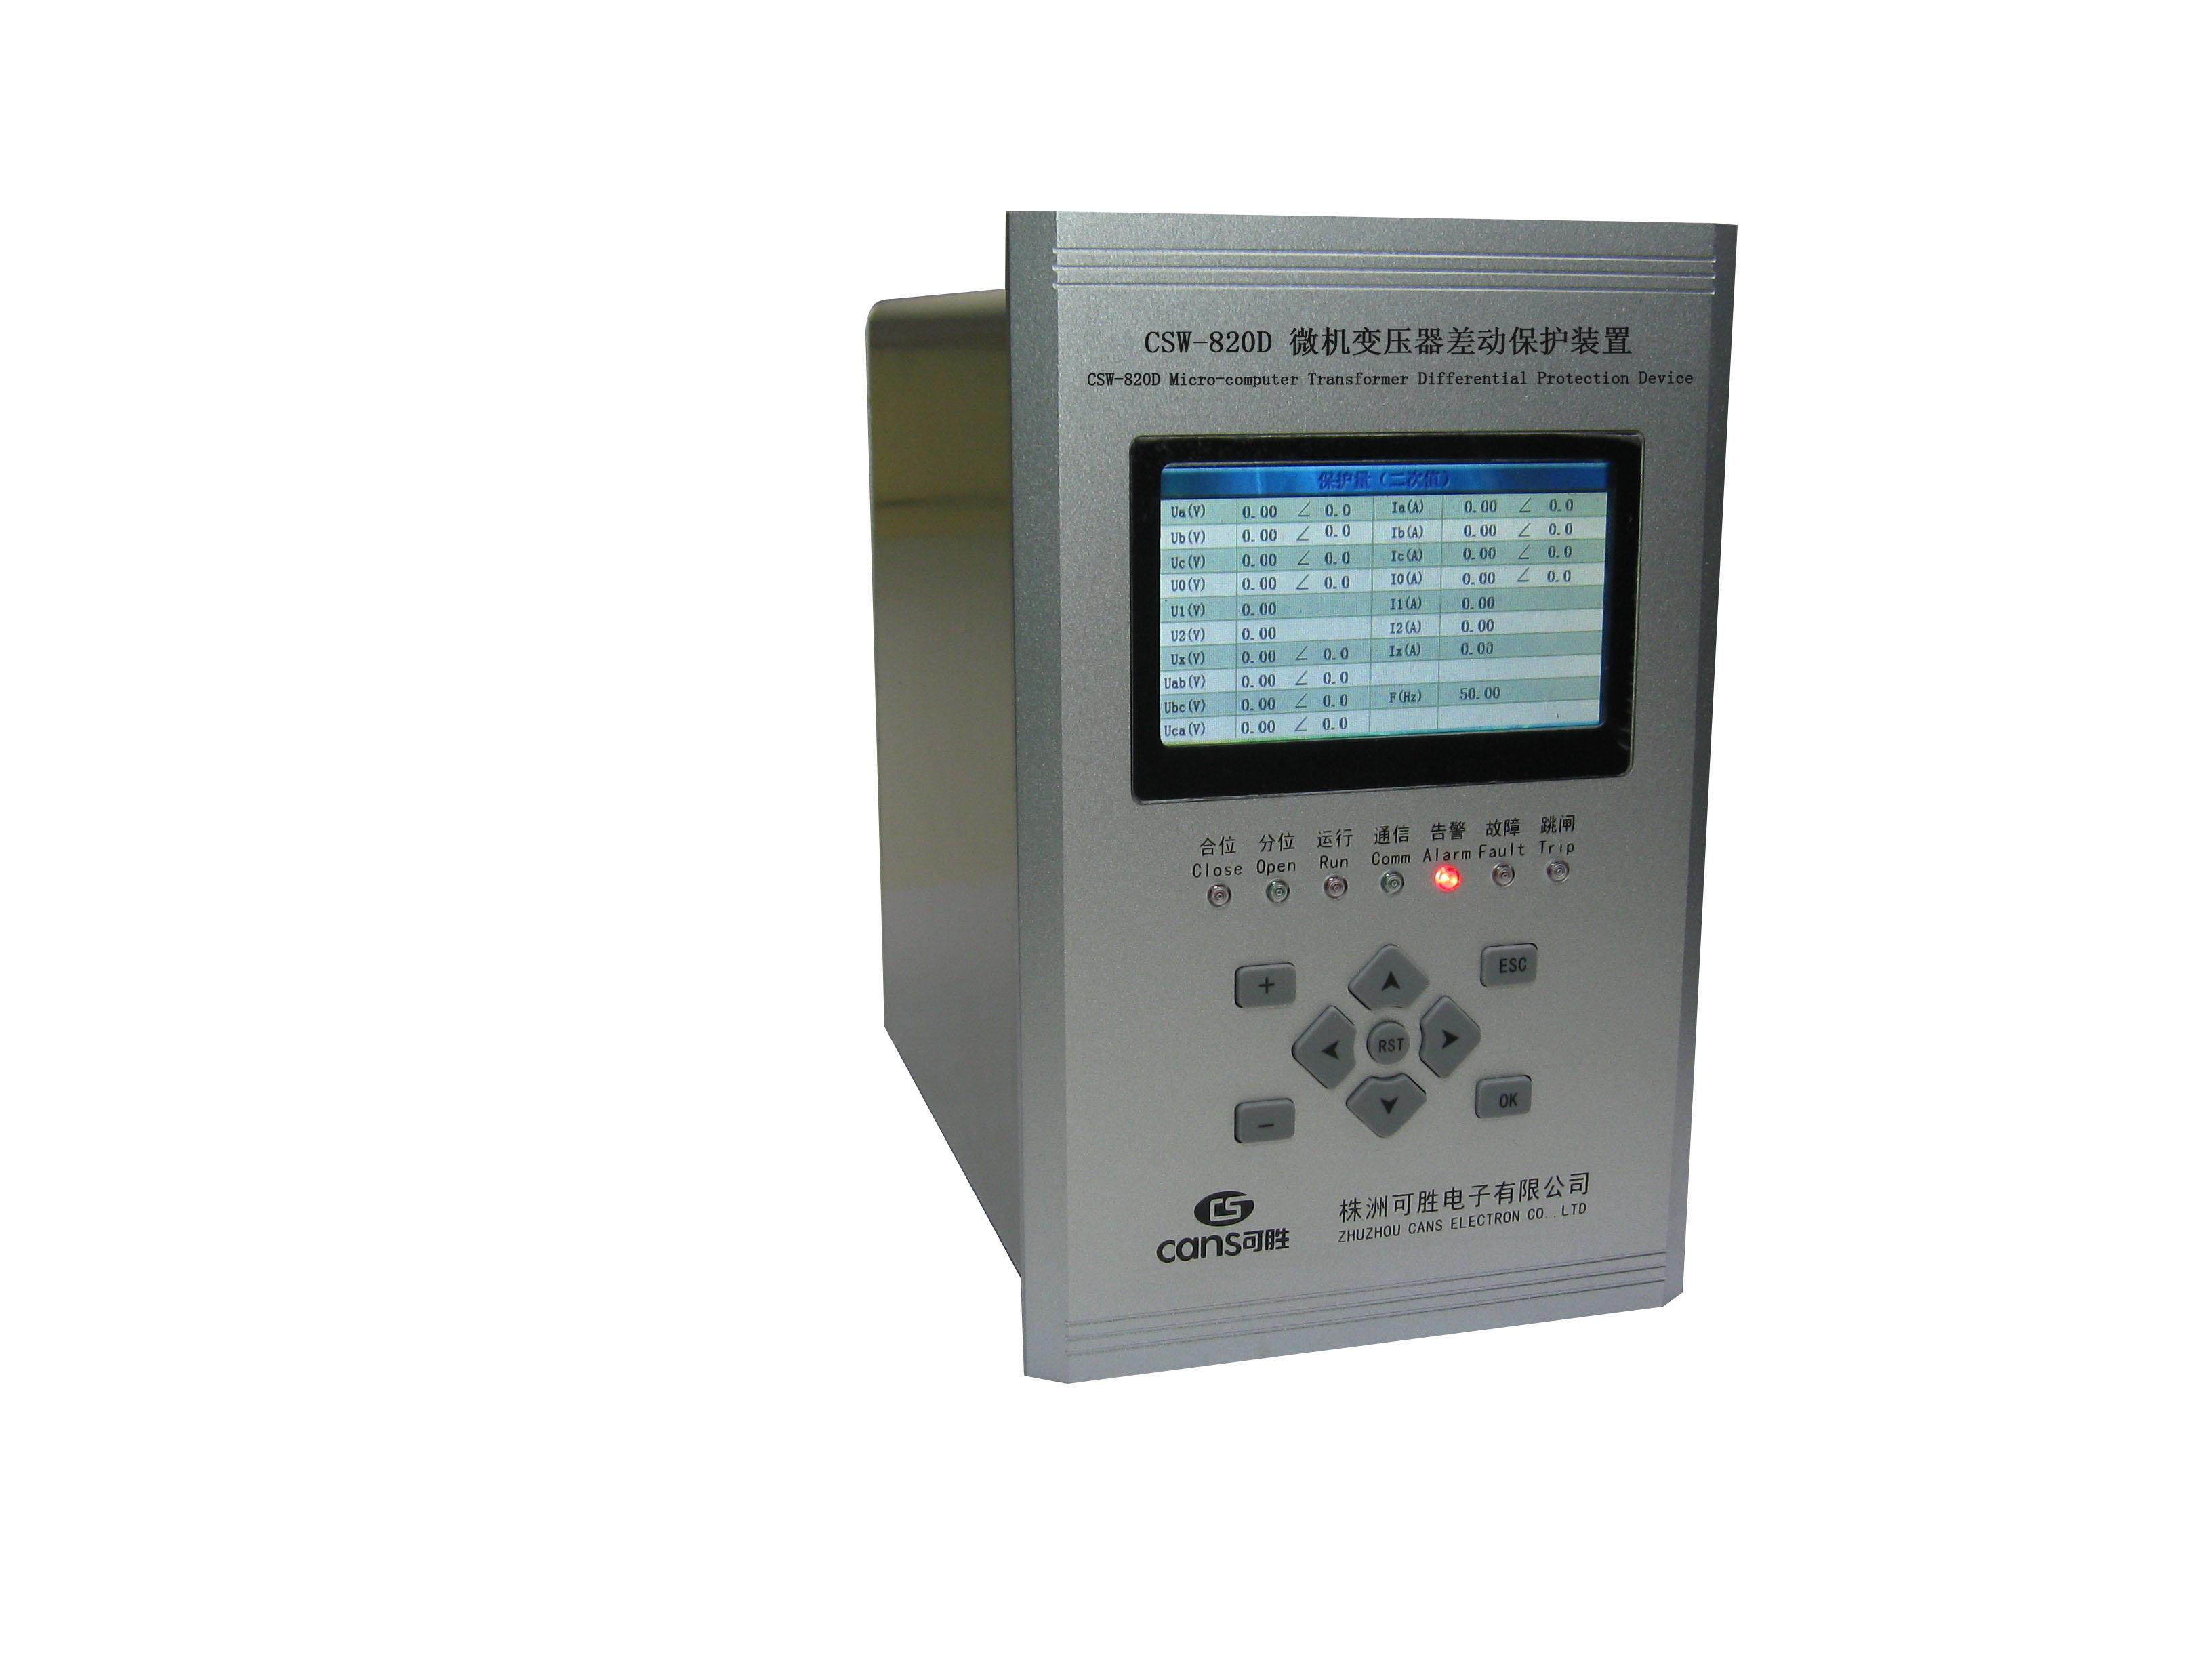 CSW-820D 微机变压器差动保 兼容SEEC-820D  湖南株洲可胜电子厂家直销